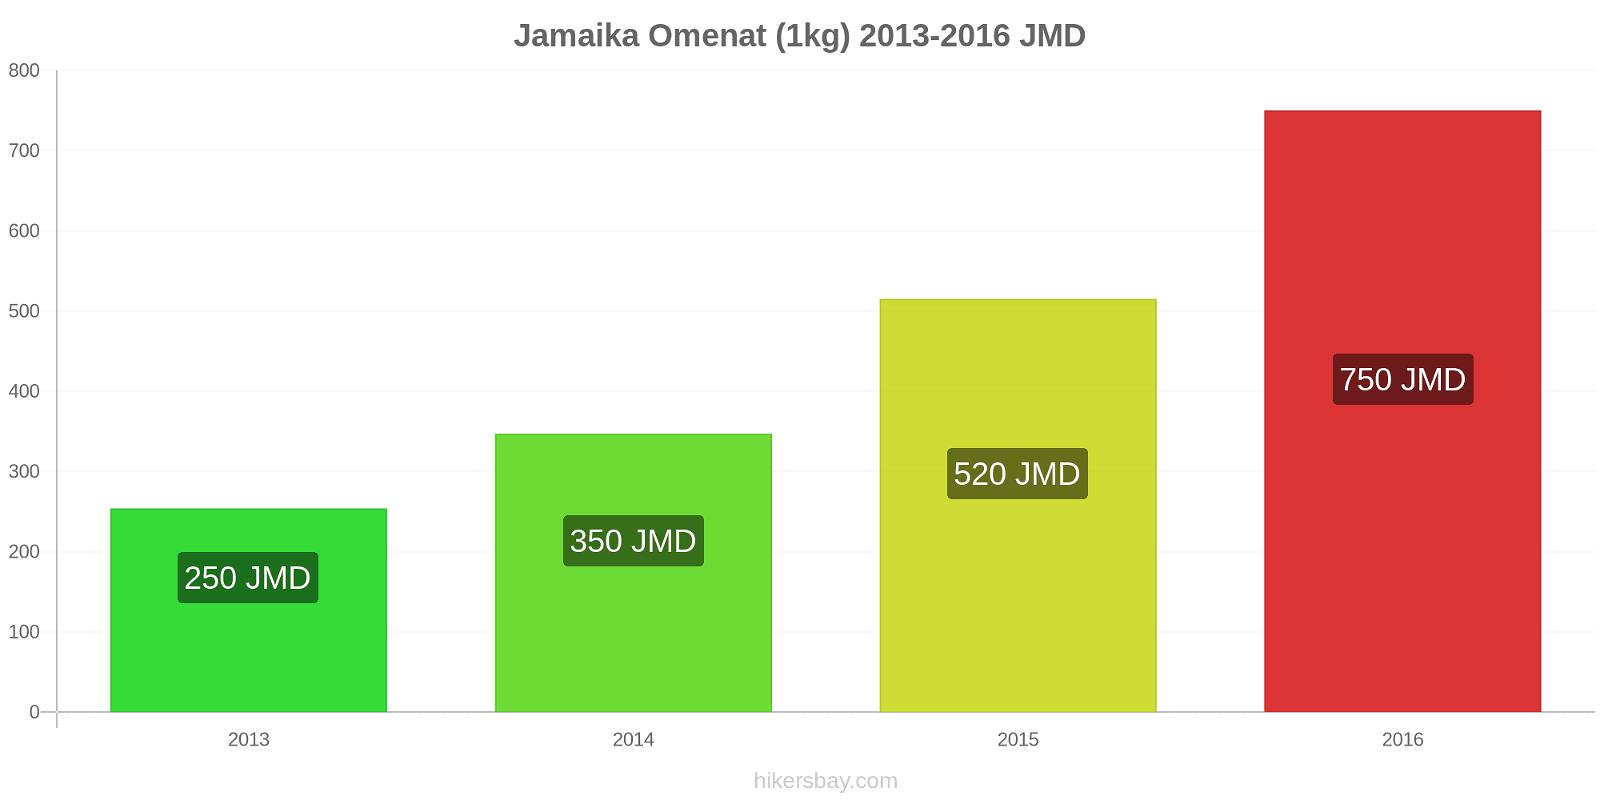 Jamaika hintojen muutokset Omenat (1kg) hikersbay.com